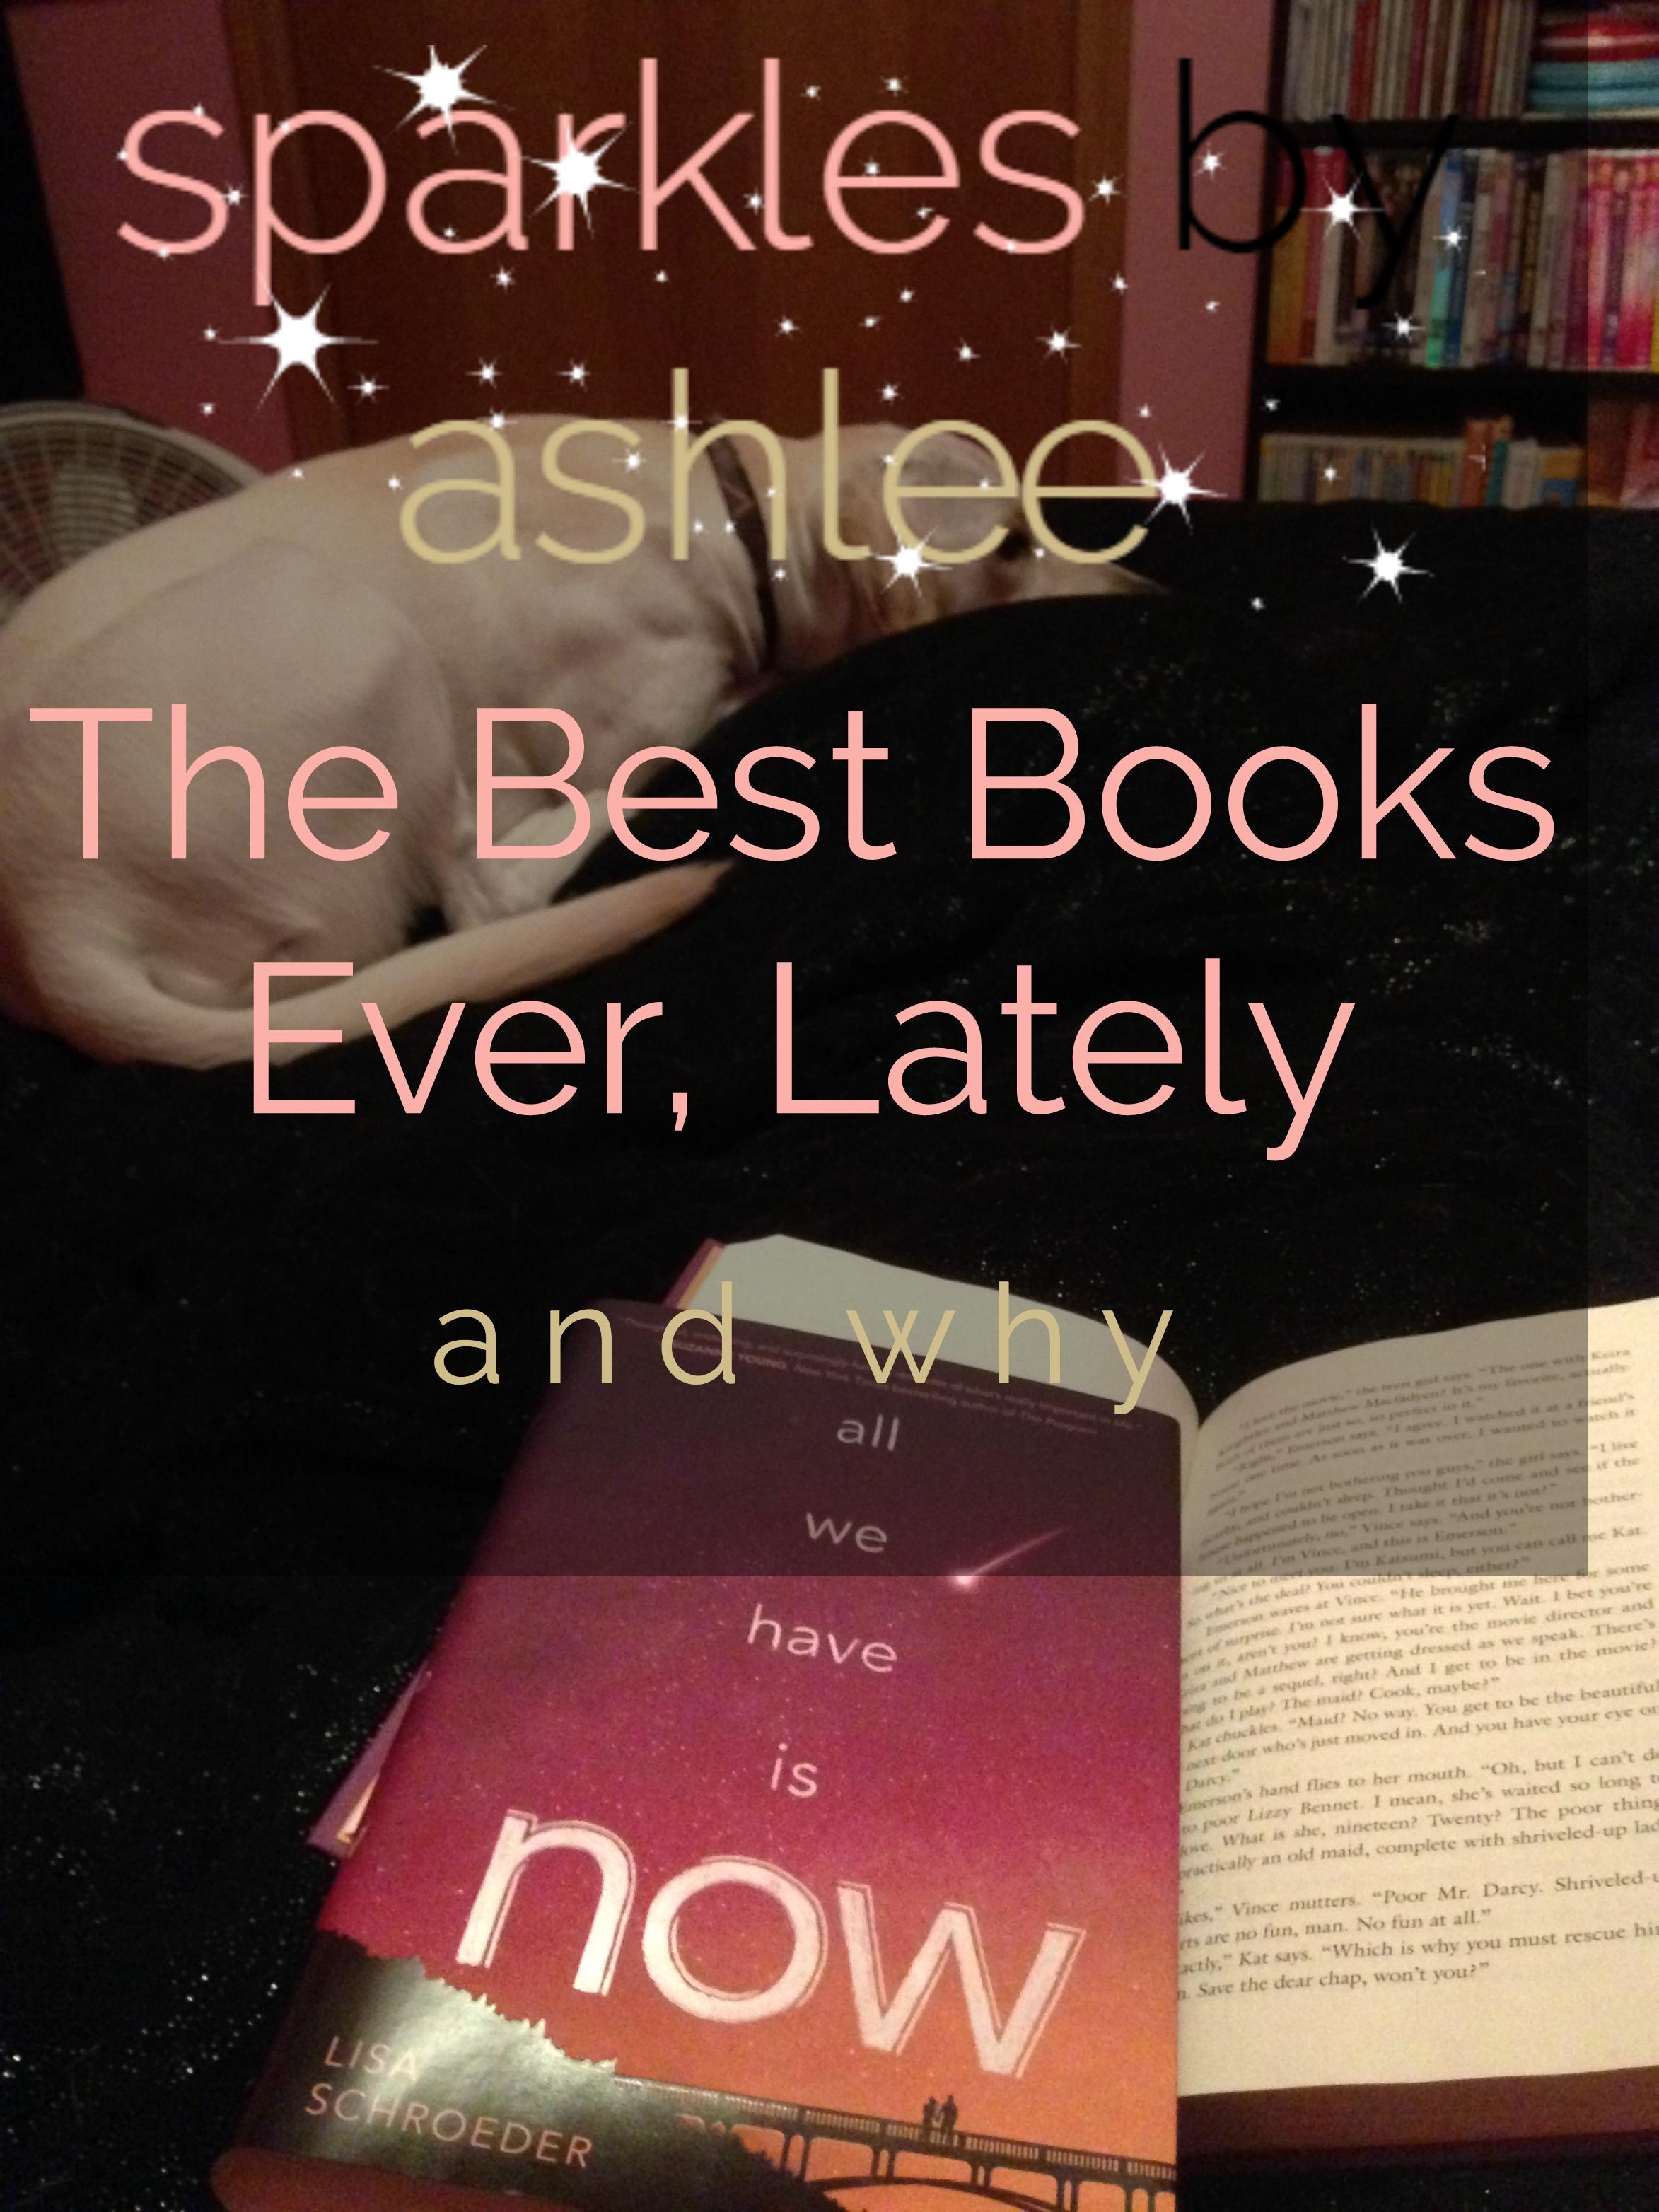 The-Best-Inspiring-Books-Ever-Lately-Sparkles-by-Ashlee.jpg